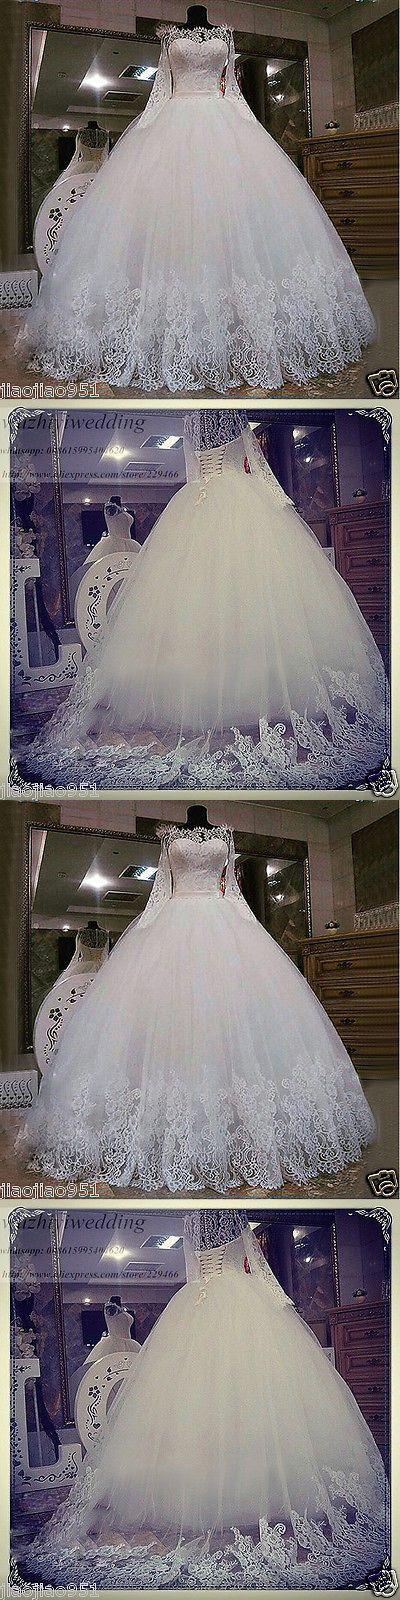 Wedding Dresses: 2017 New Lace White Ivory Wedding Dress Bridal Gown Custom 4 6 8 10 12 14 16 18+ -> BUY IT NOW ONLY: $138 on eBay!